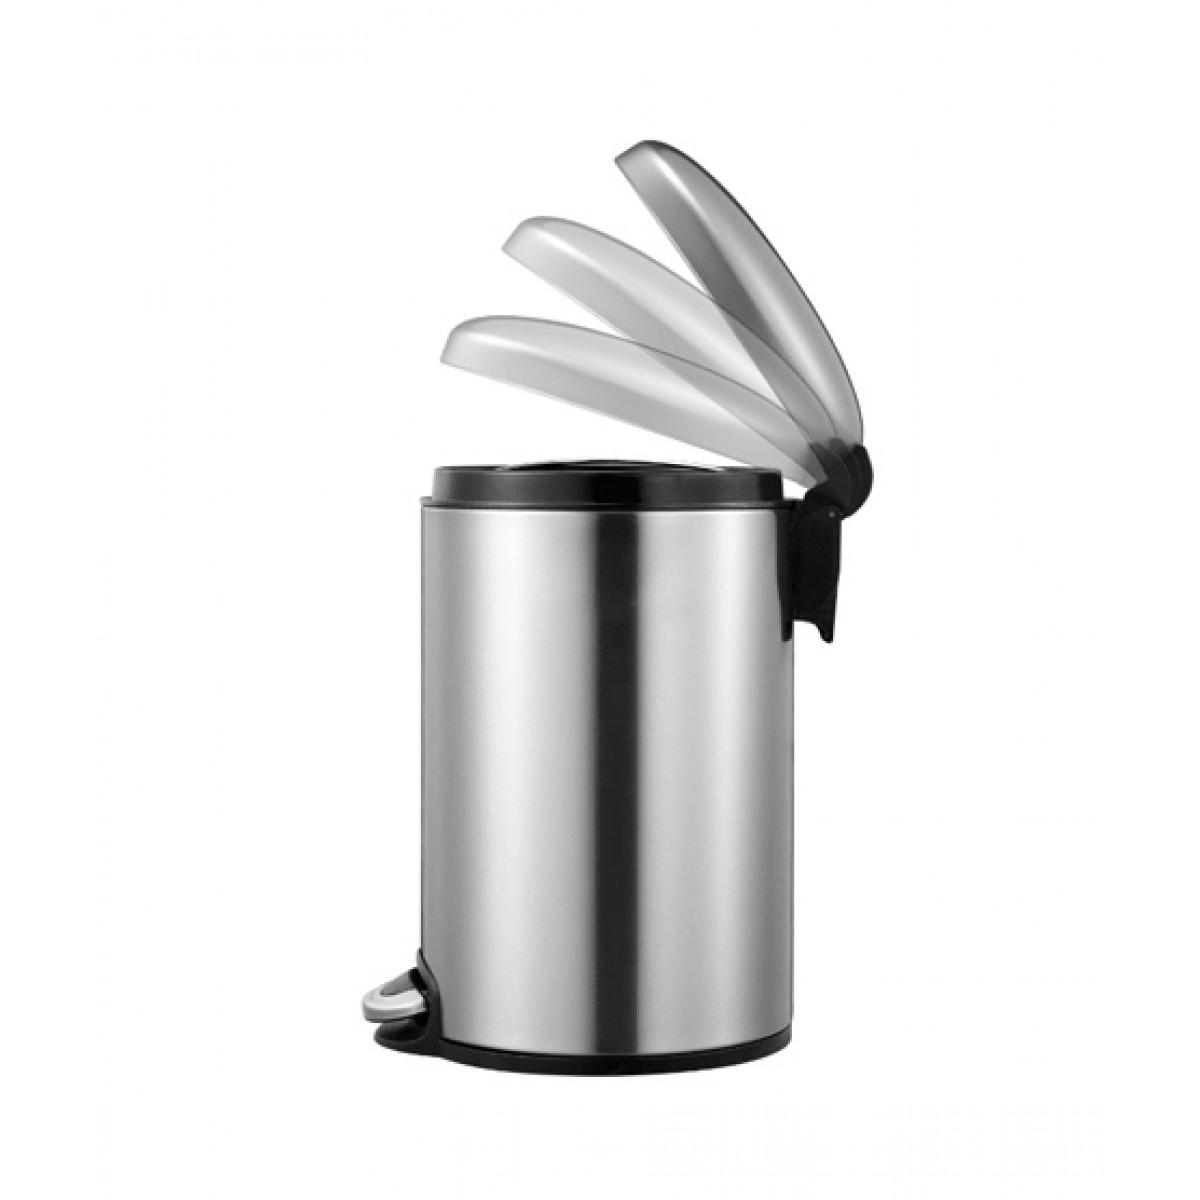 Eko Maggey Step Bin 5 Liter Silver (EK9213-5L)